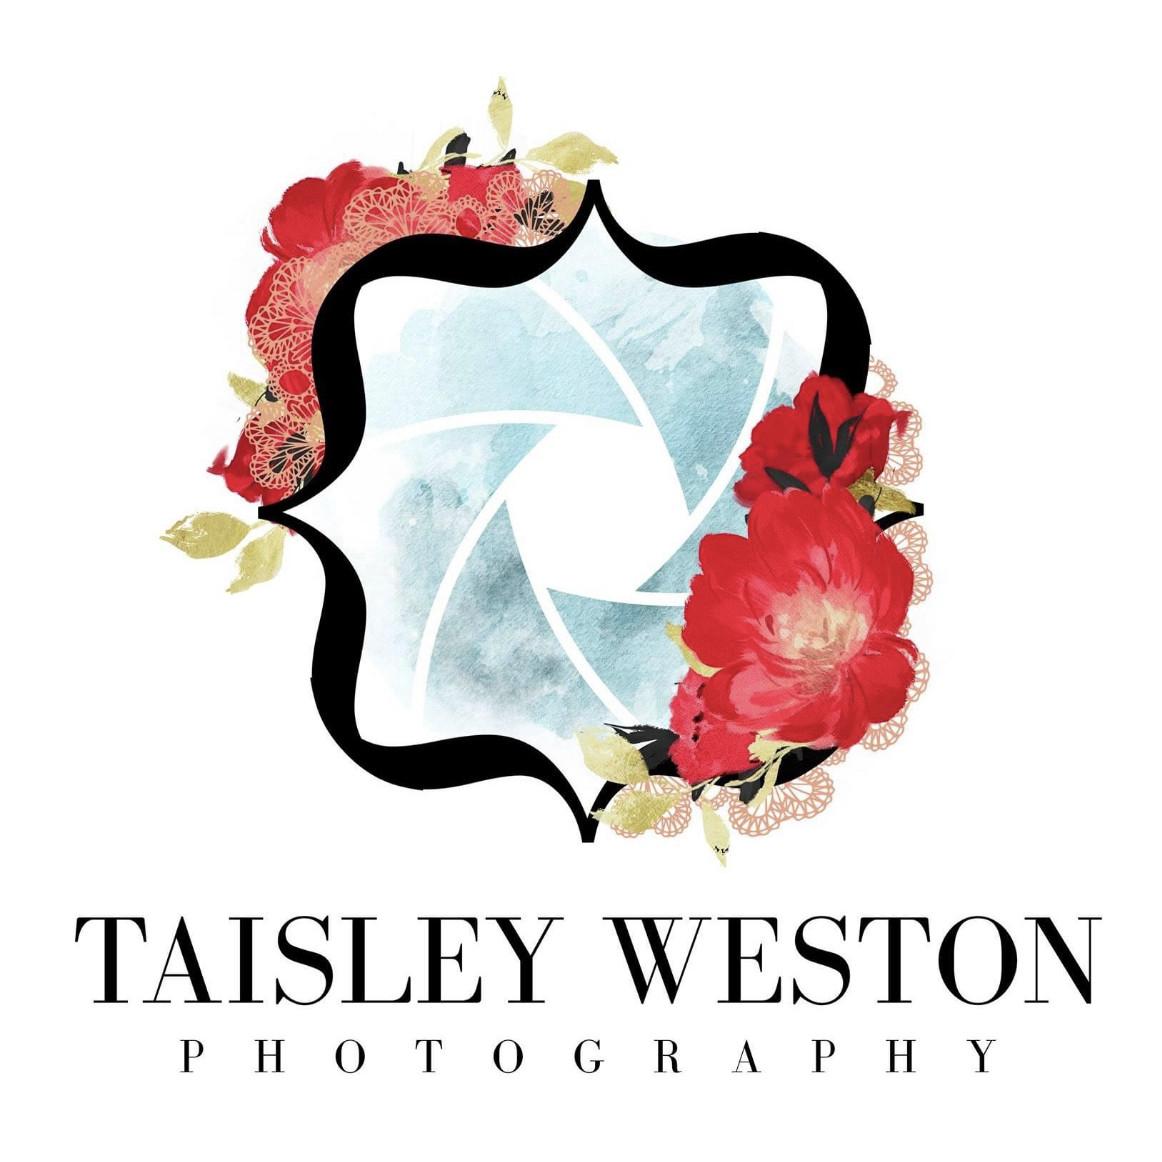 Taisley Weston Photography